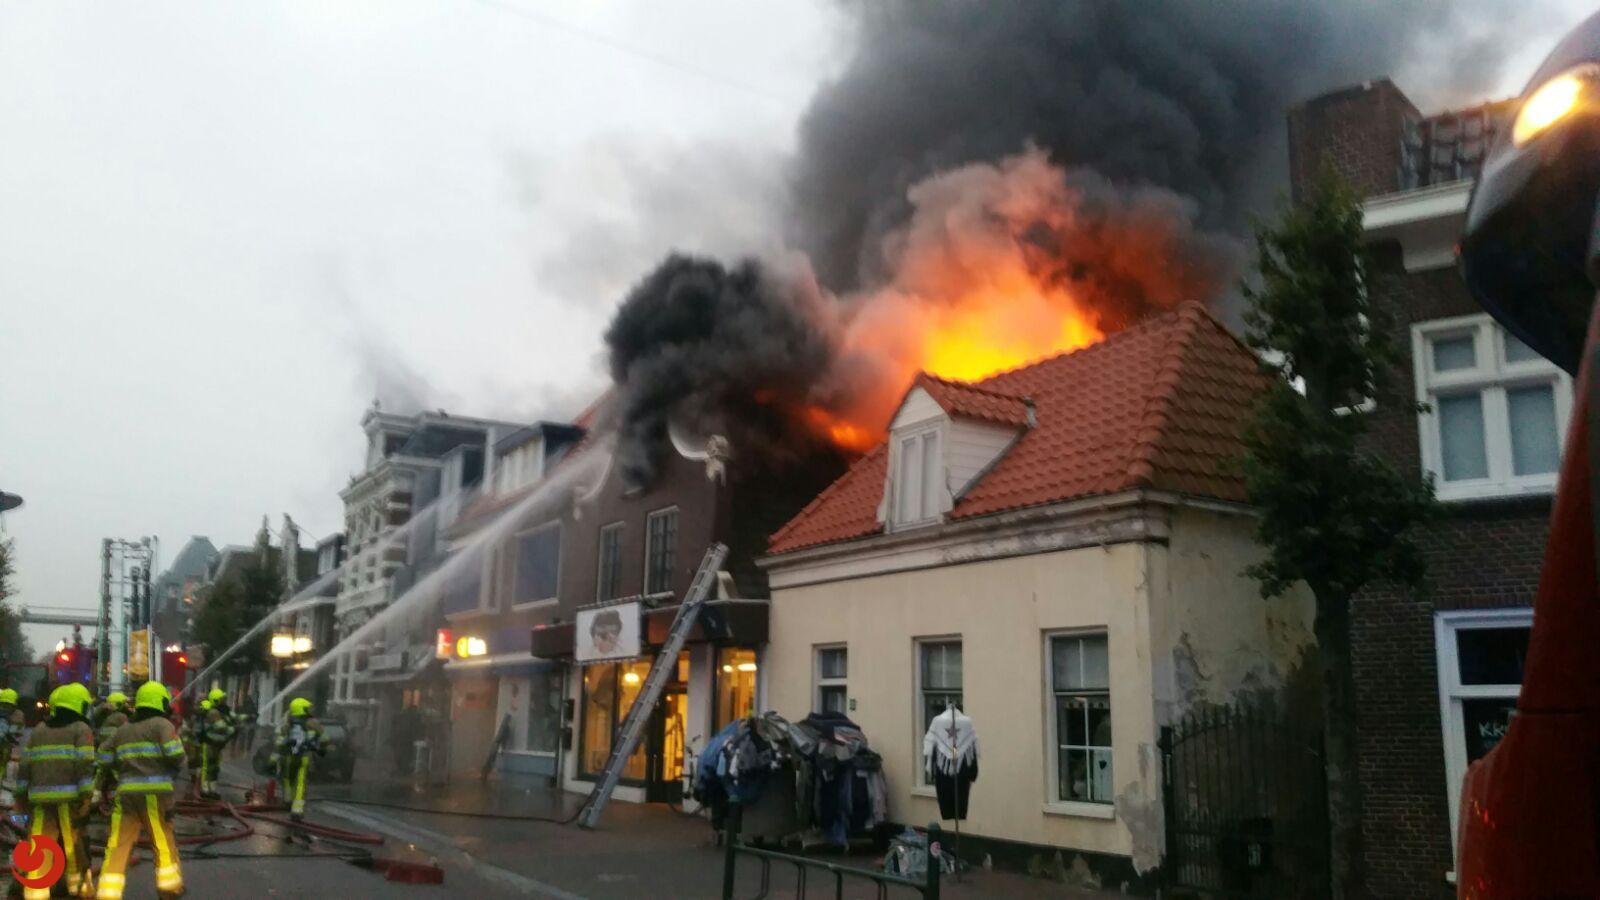 Grote brand verwoest winkelpand in centrum Gorredijk